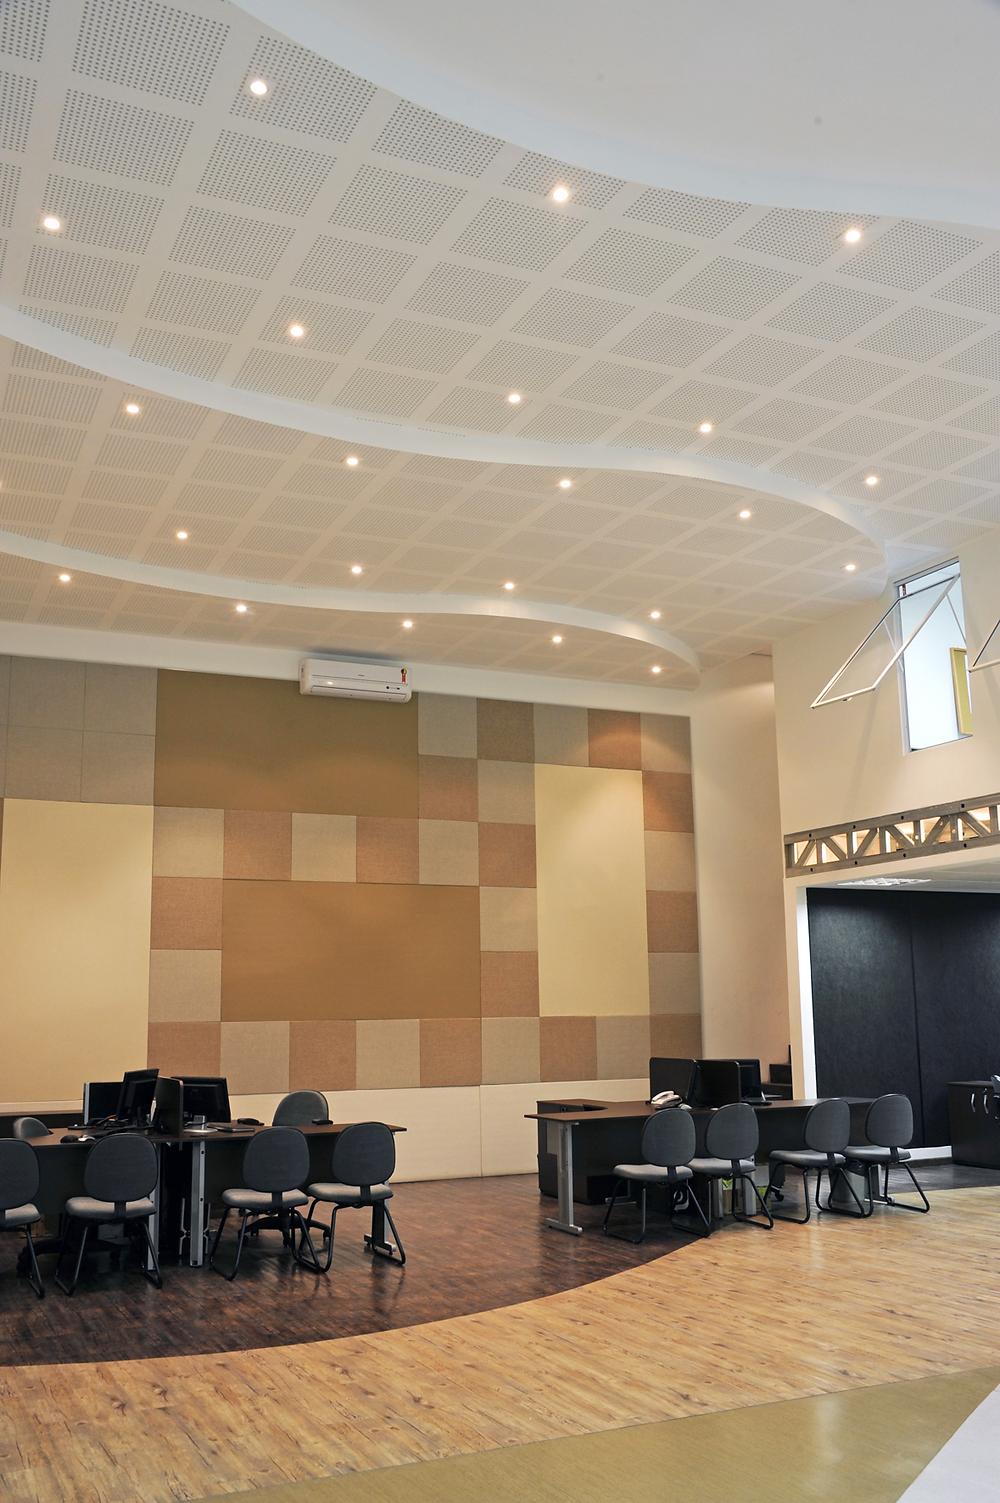 Forros e paredes em Drywall na Brasgips